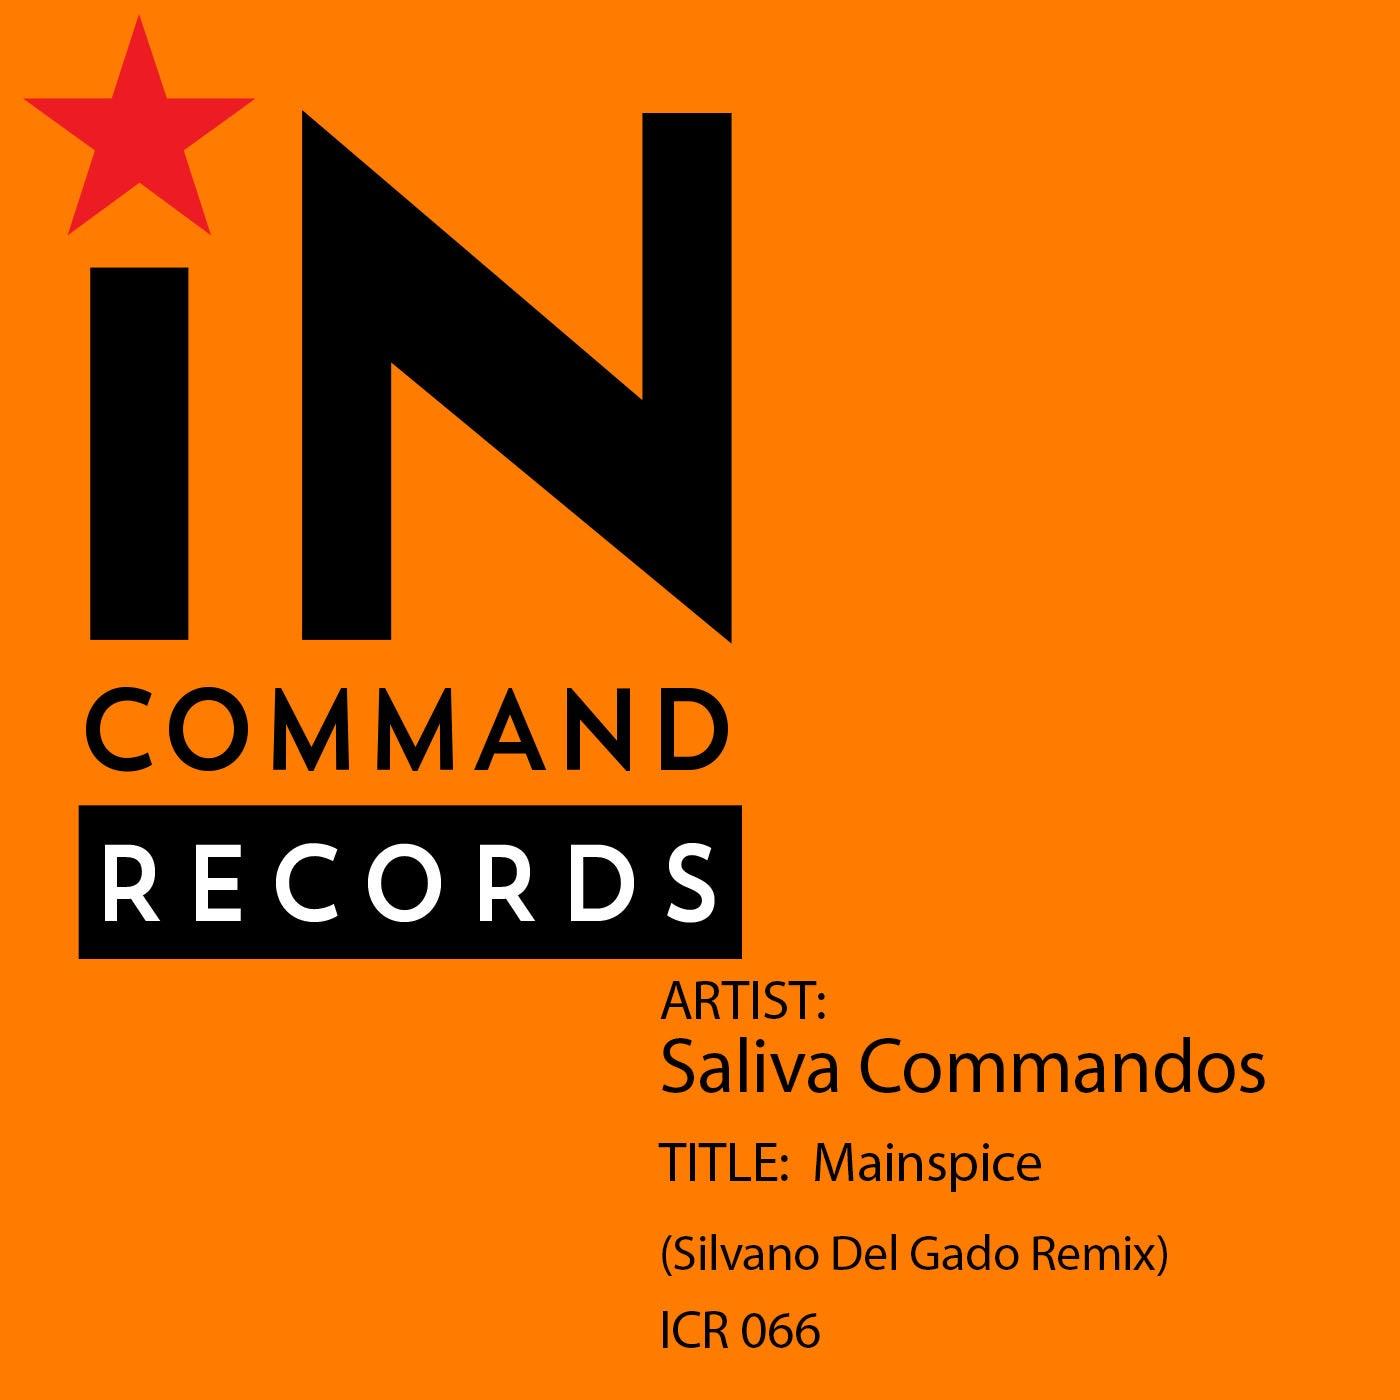 Mainspice (Silvano Del Gado Remix)